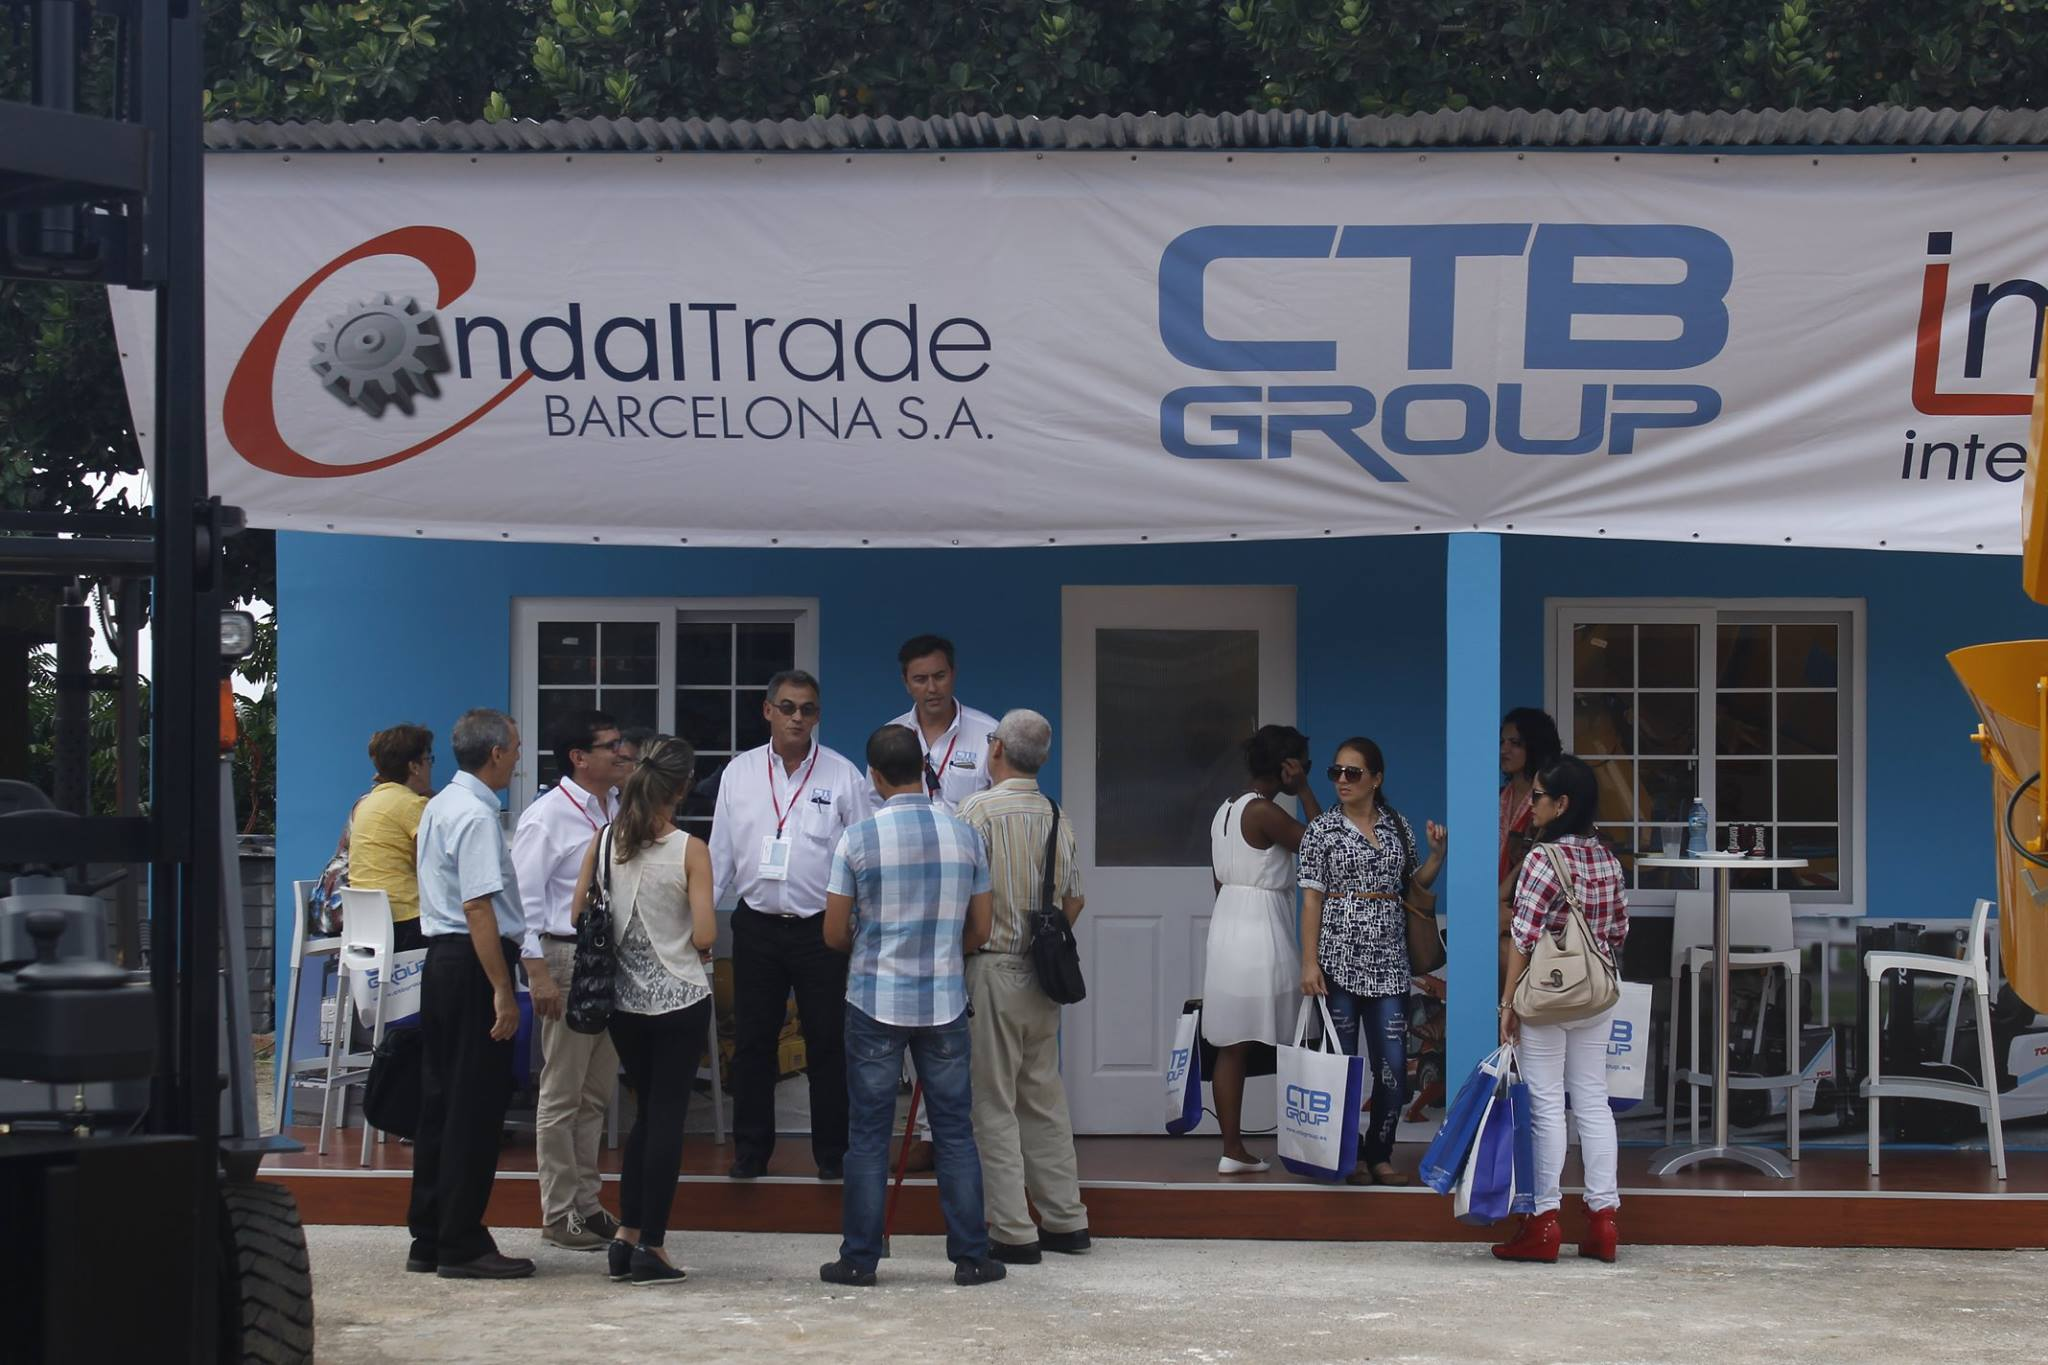 ctb-group-feria-internacional-la-habana-7